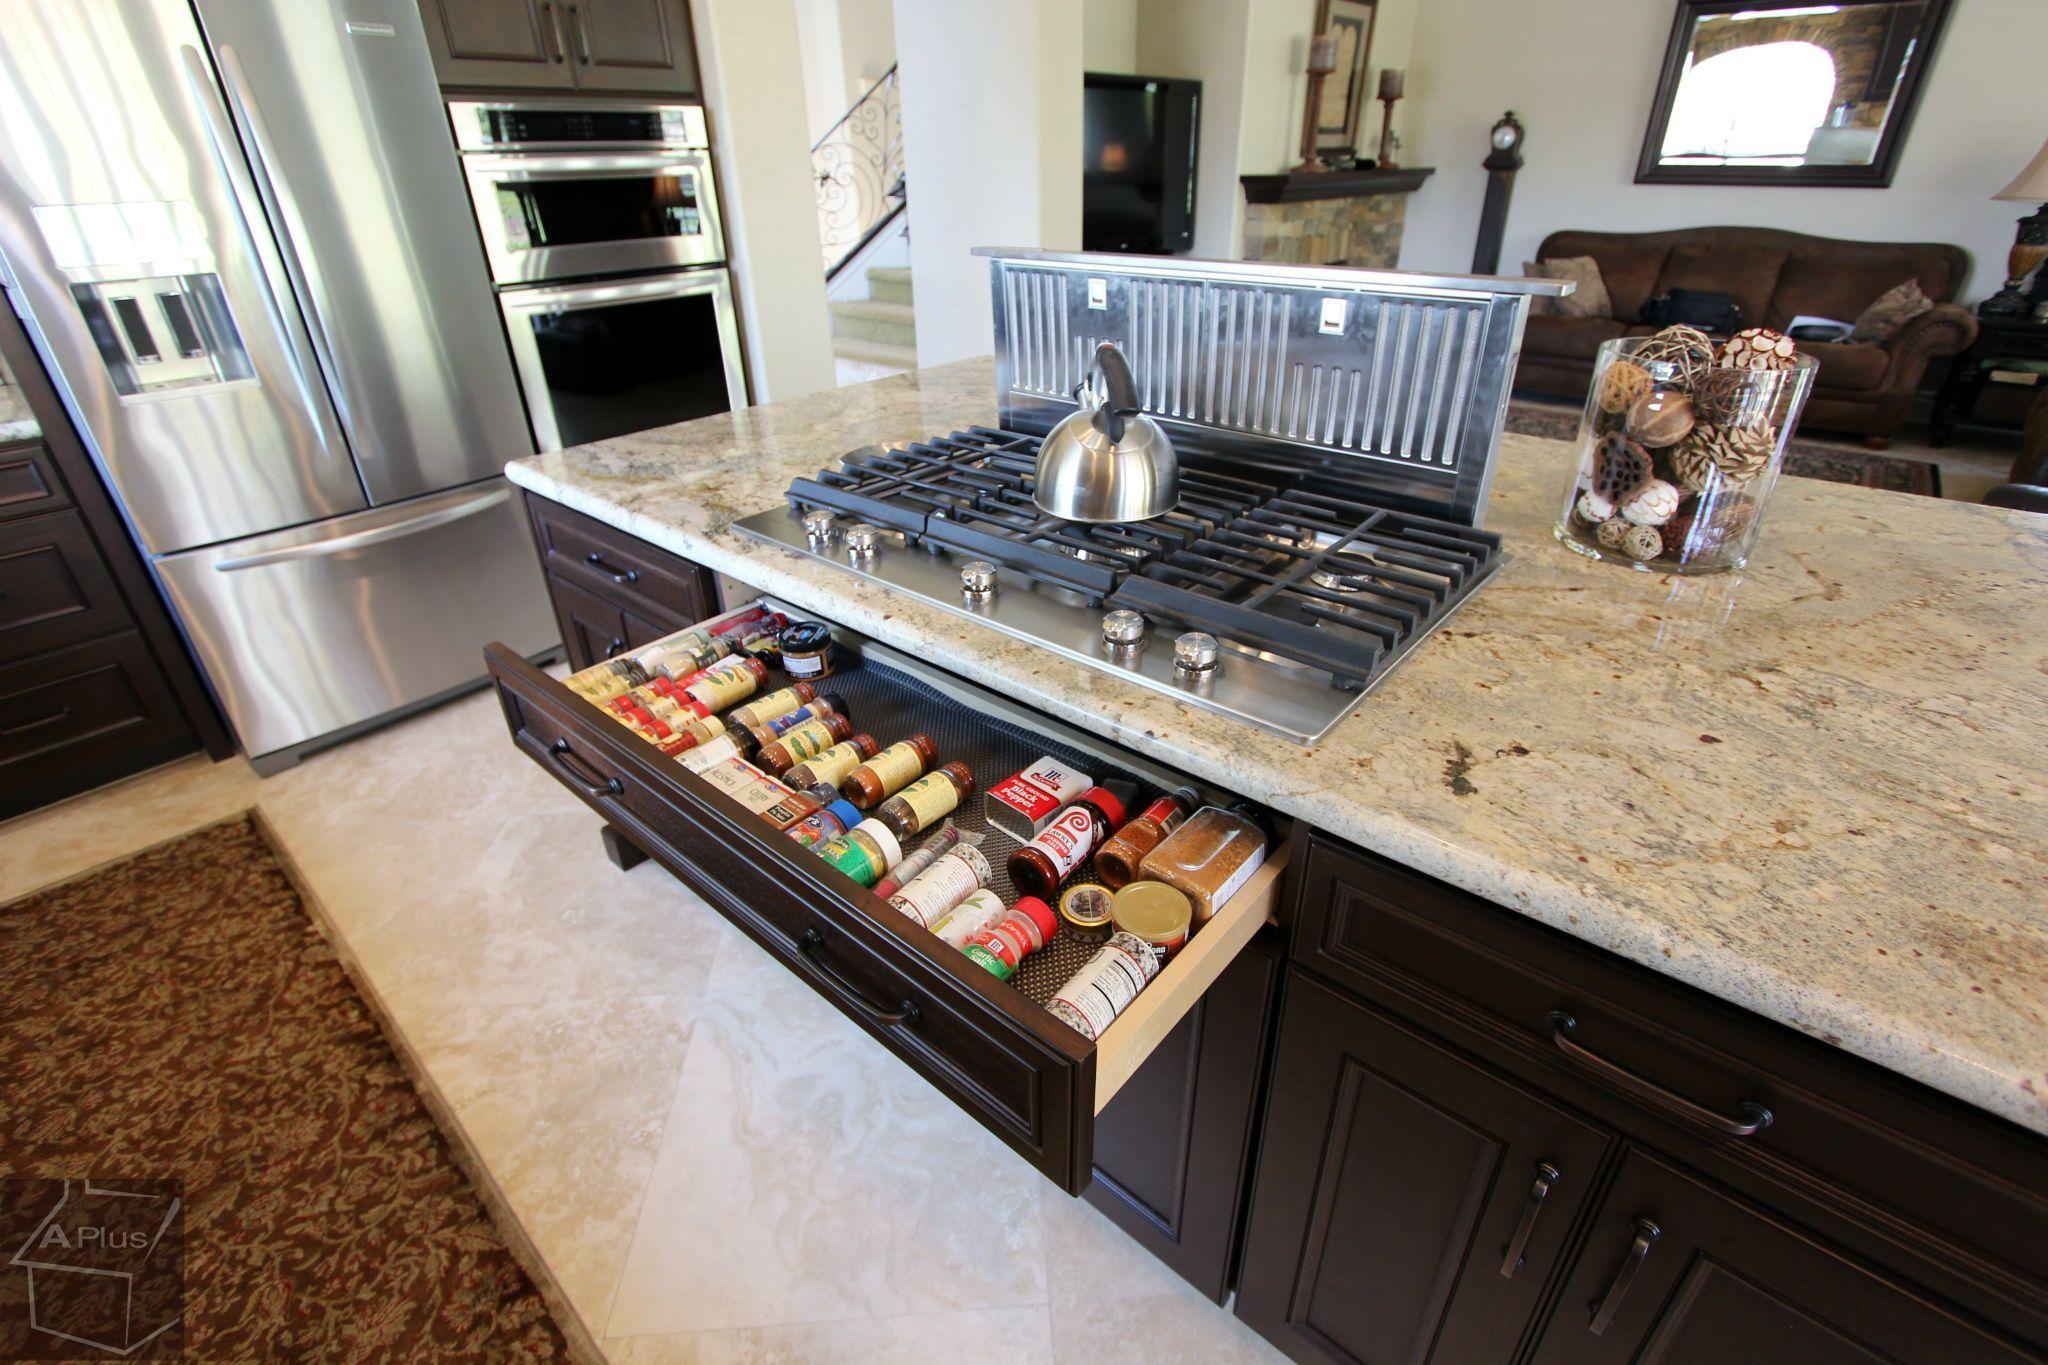 Kitchen Designer Orange County Unique Design Build Traditional #kitchenremodel With #customcabinets Design Inspiration